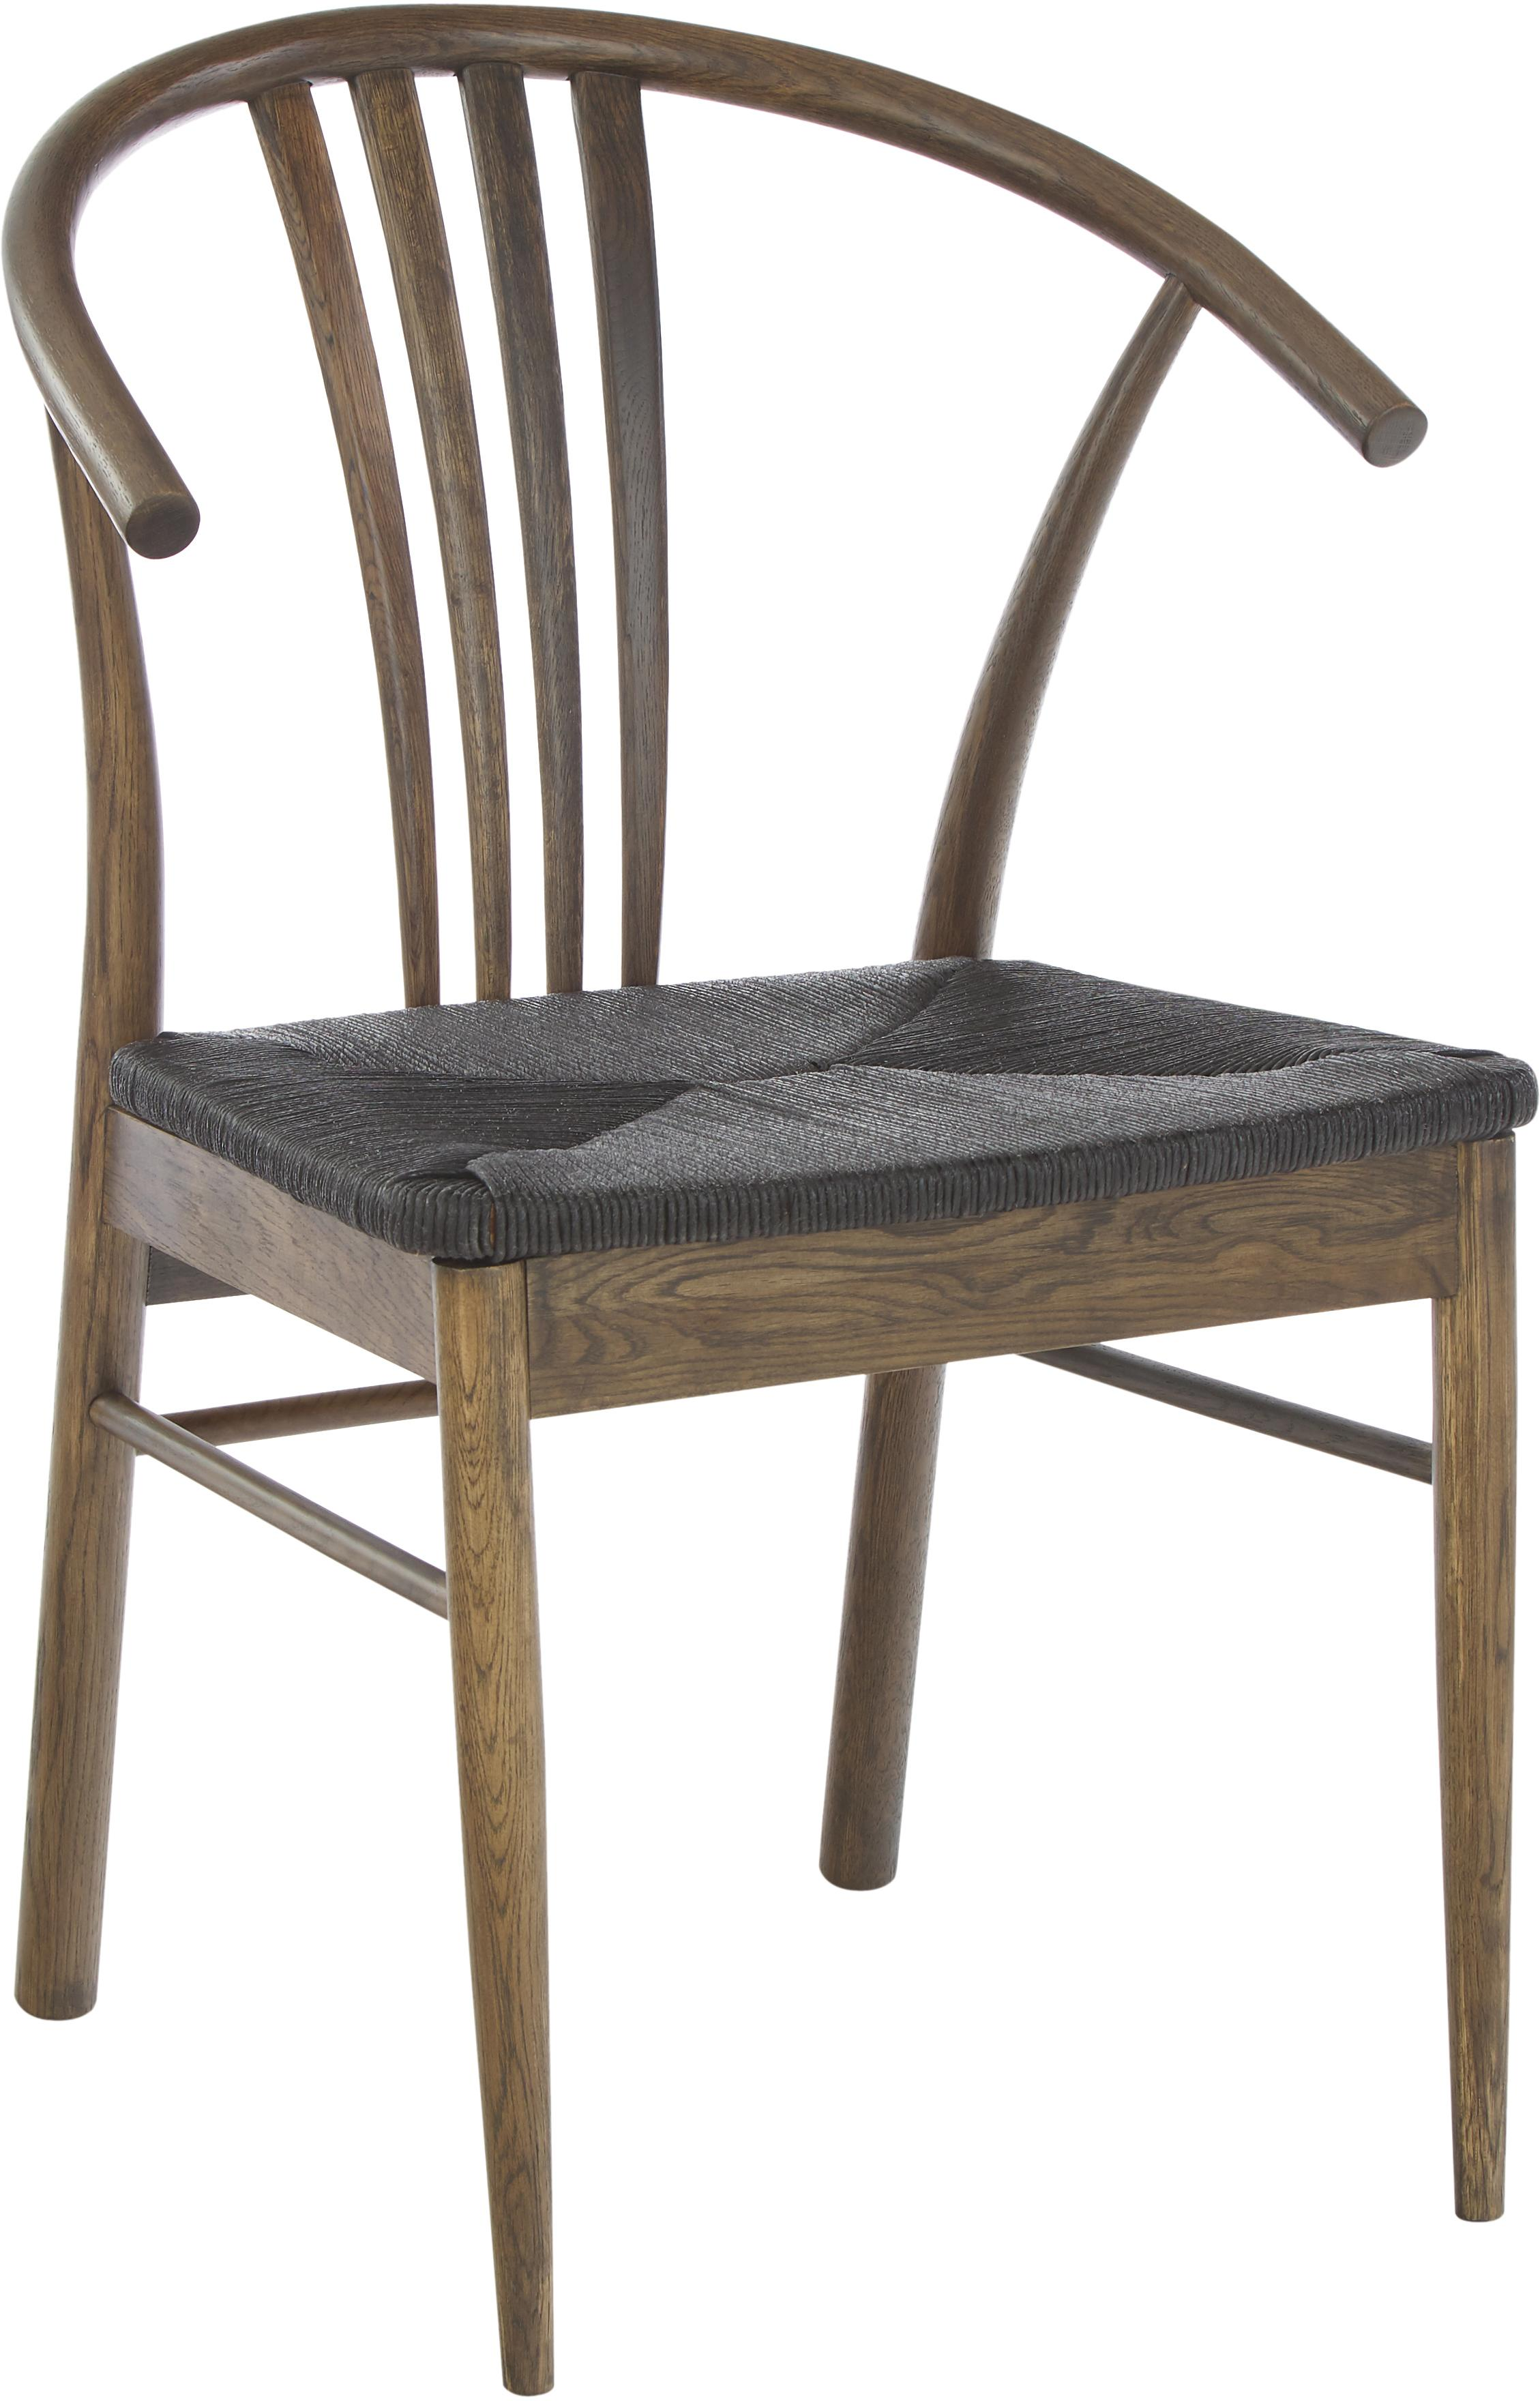 Stoel York, Frame: eikenhout, gebeitst, Zitvlak: papieren touw, gevlochten, Zwart, donkerbruin, B 54 x D 54 cm